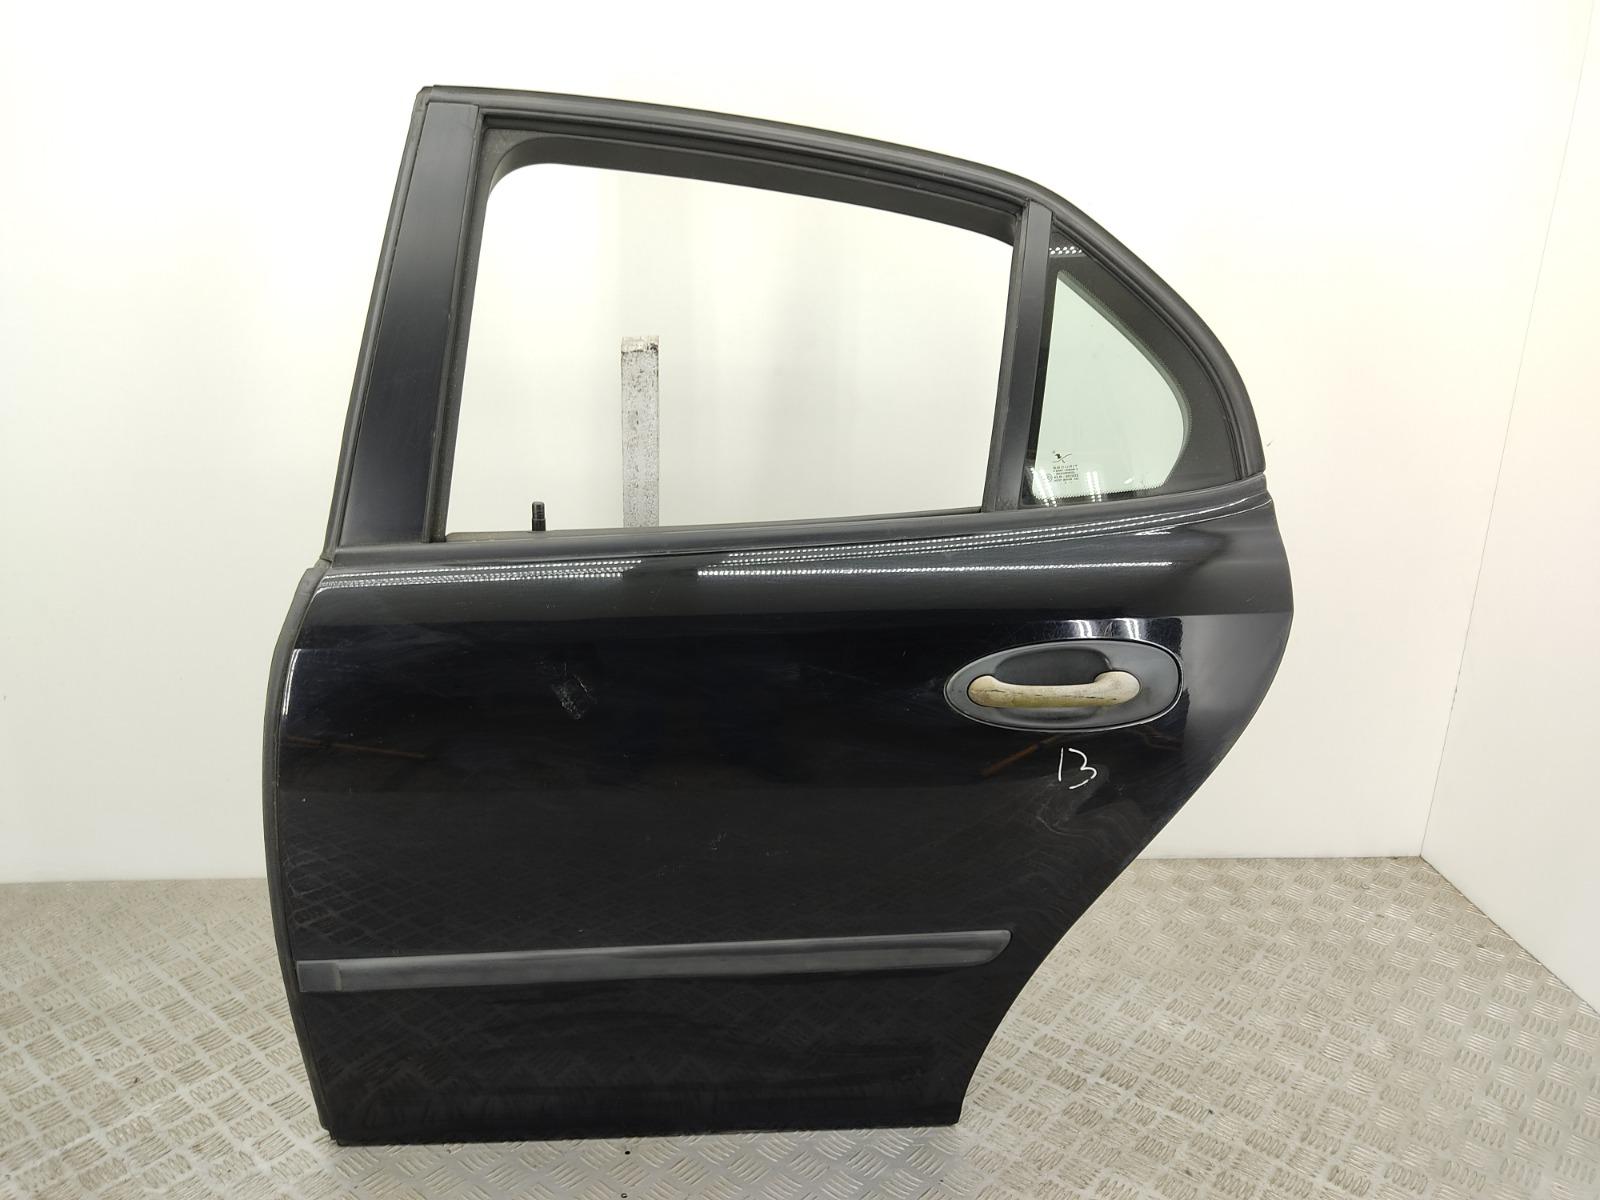 Дверь задняя левая Saab 9-3 2.0 TI 2003 (б/у)